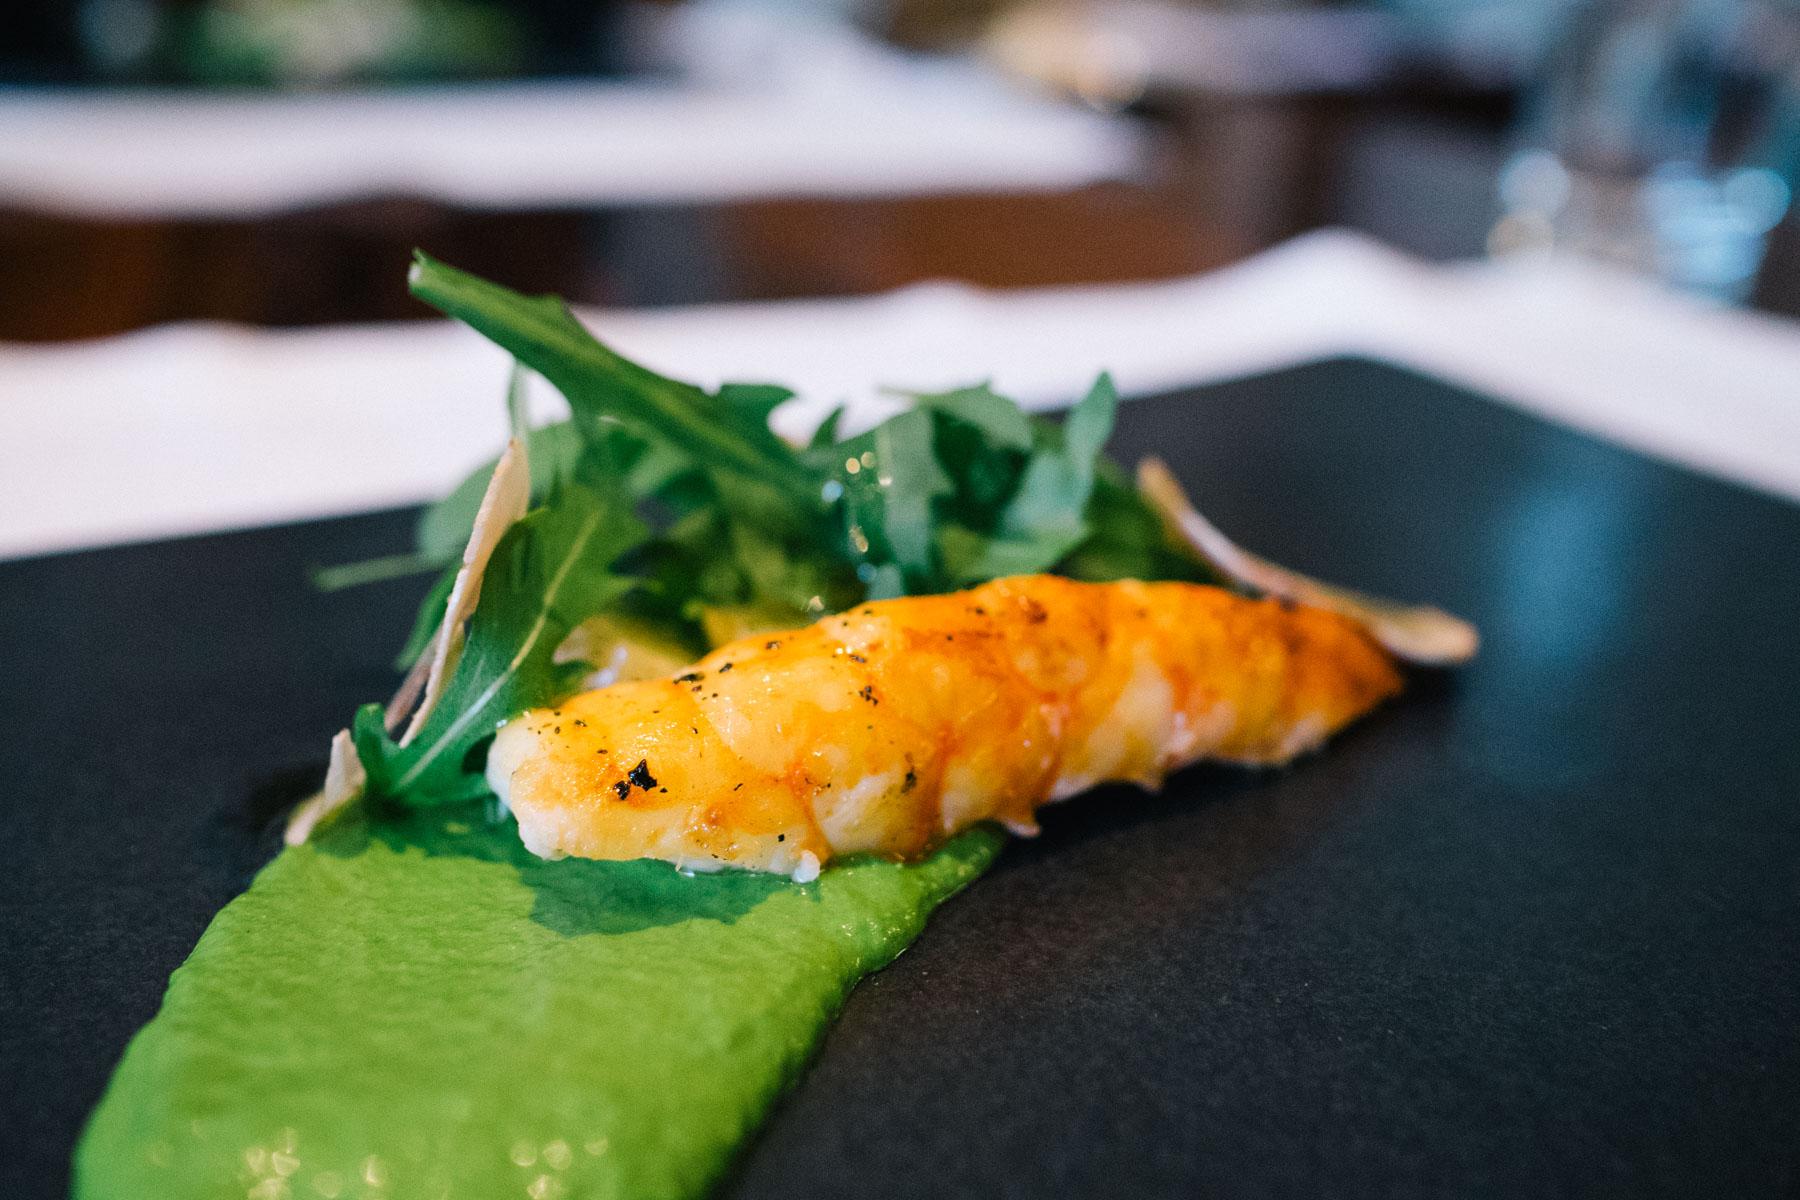 sao-paulo-worlds-best-restaurant-dom-brazil-brasil-michelin-star-15